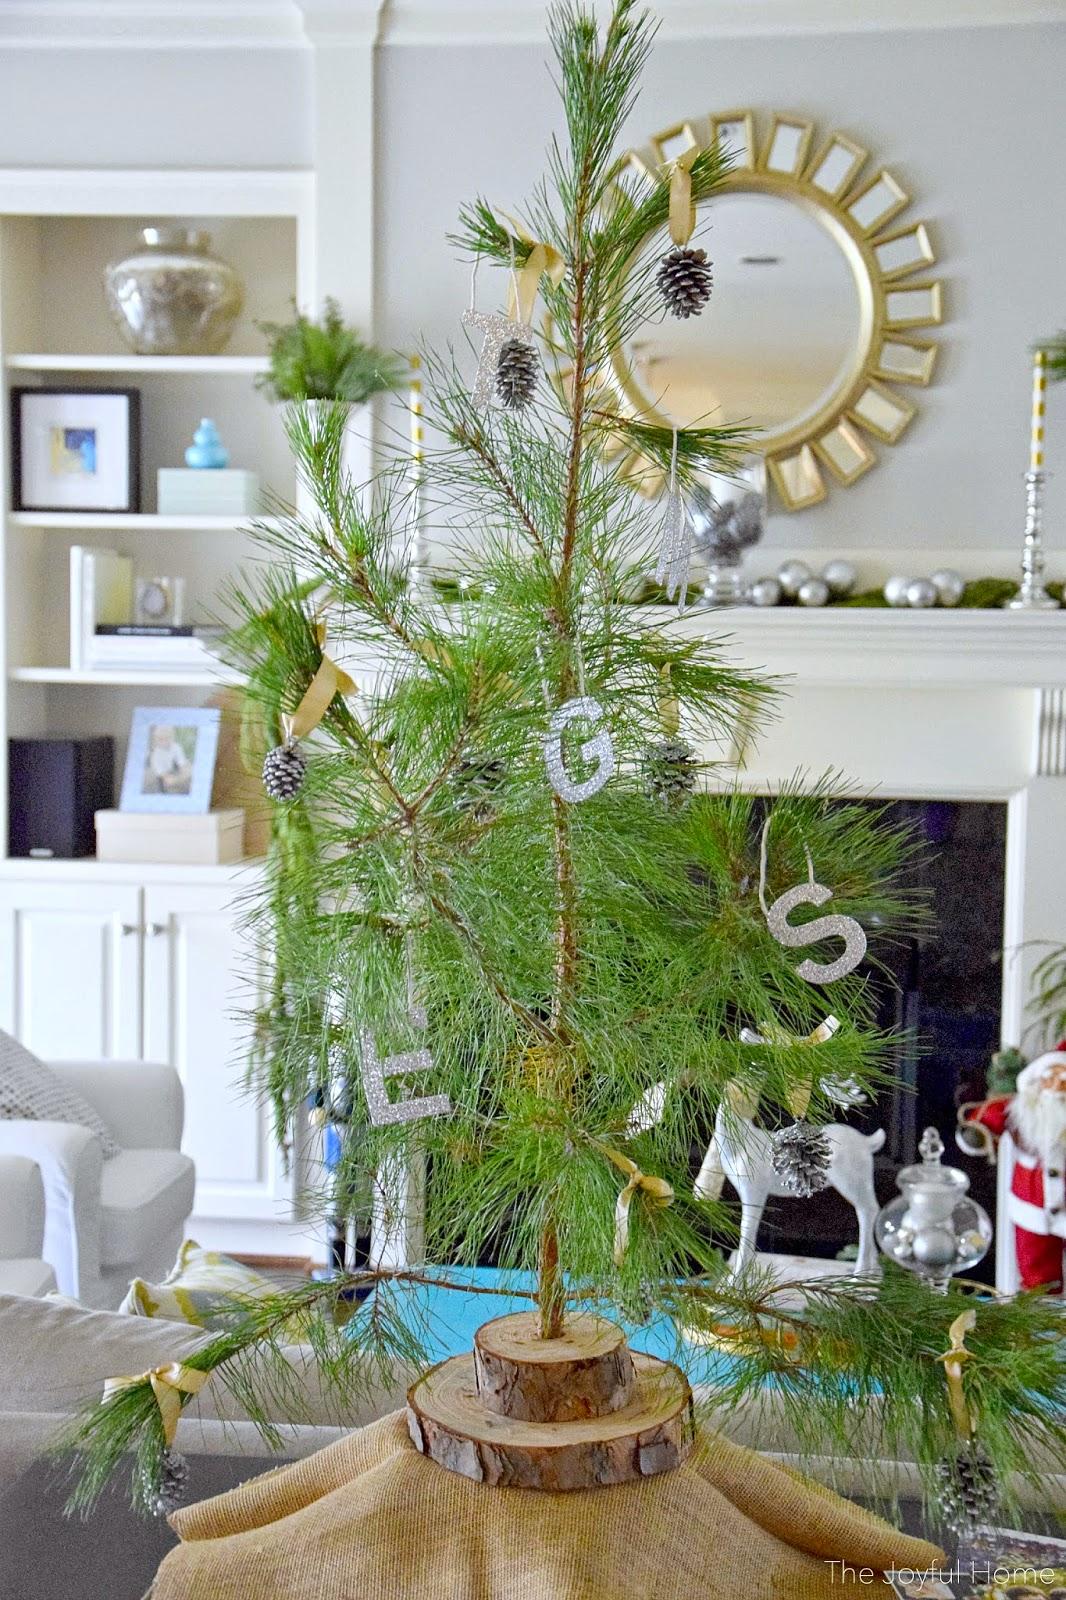 The Joyful Home Christmas Home Tour 2014 - The Joyful Home